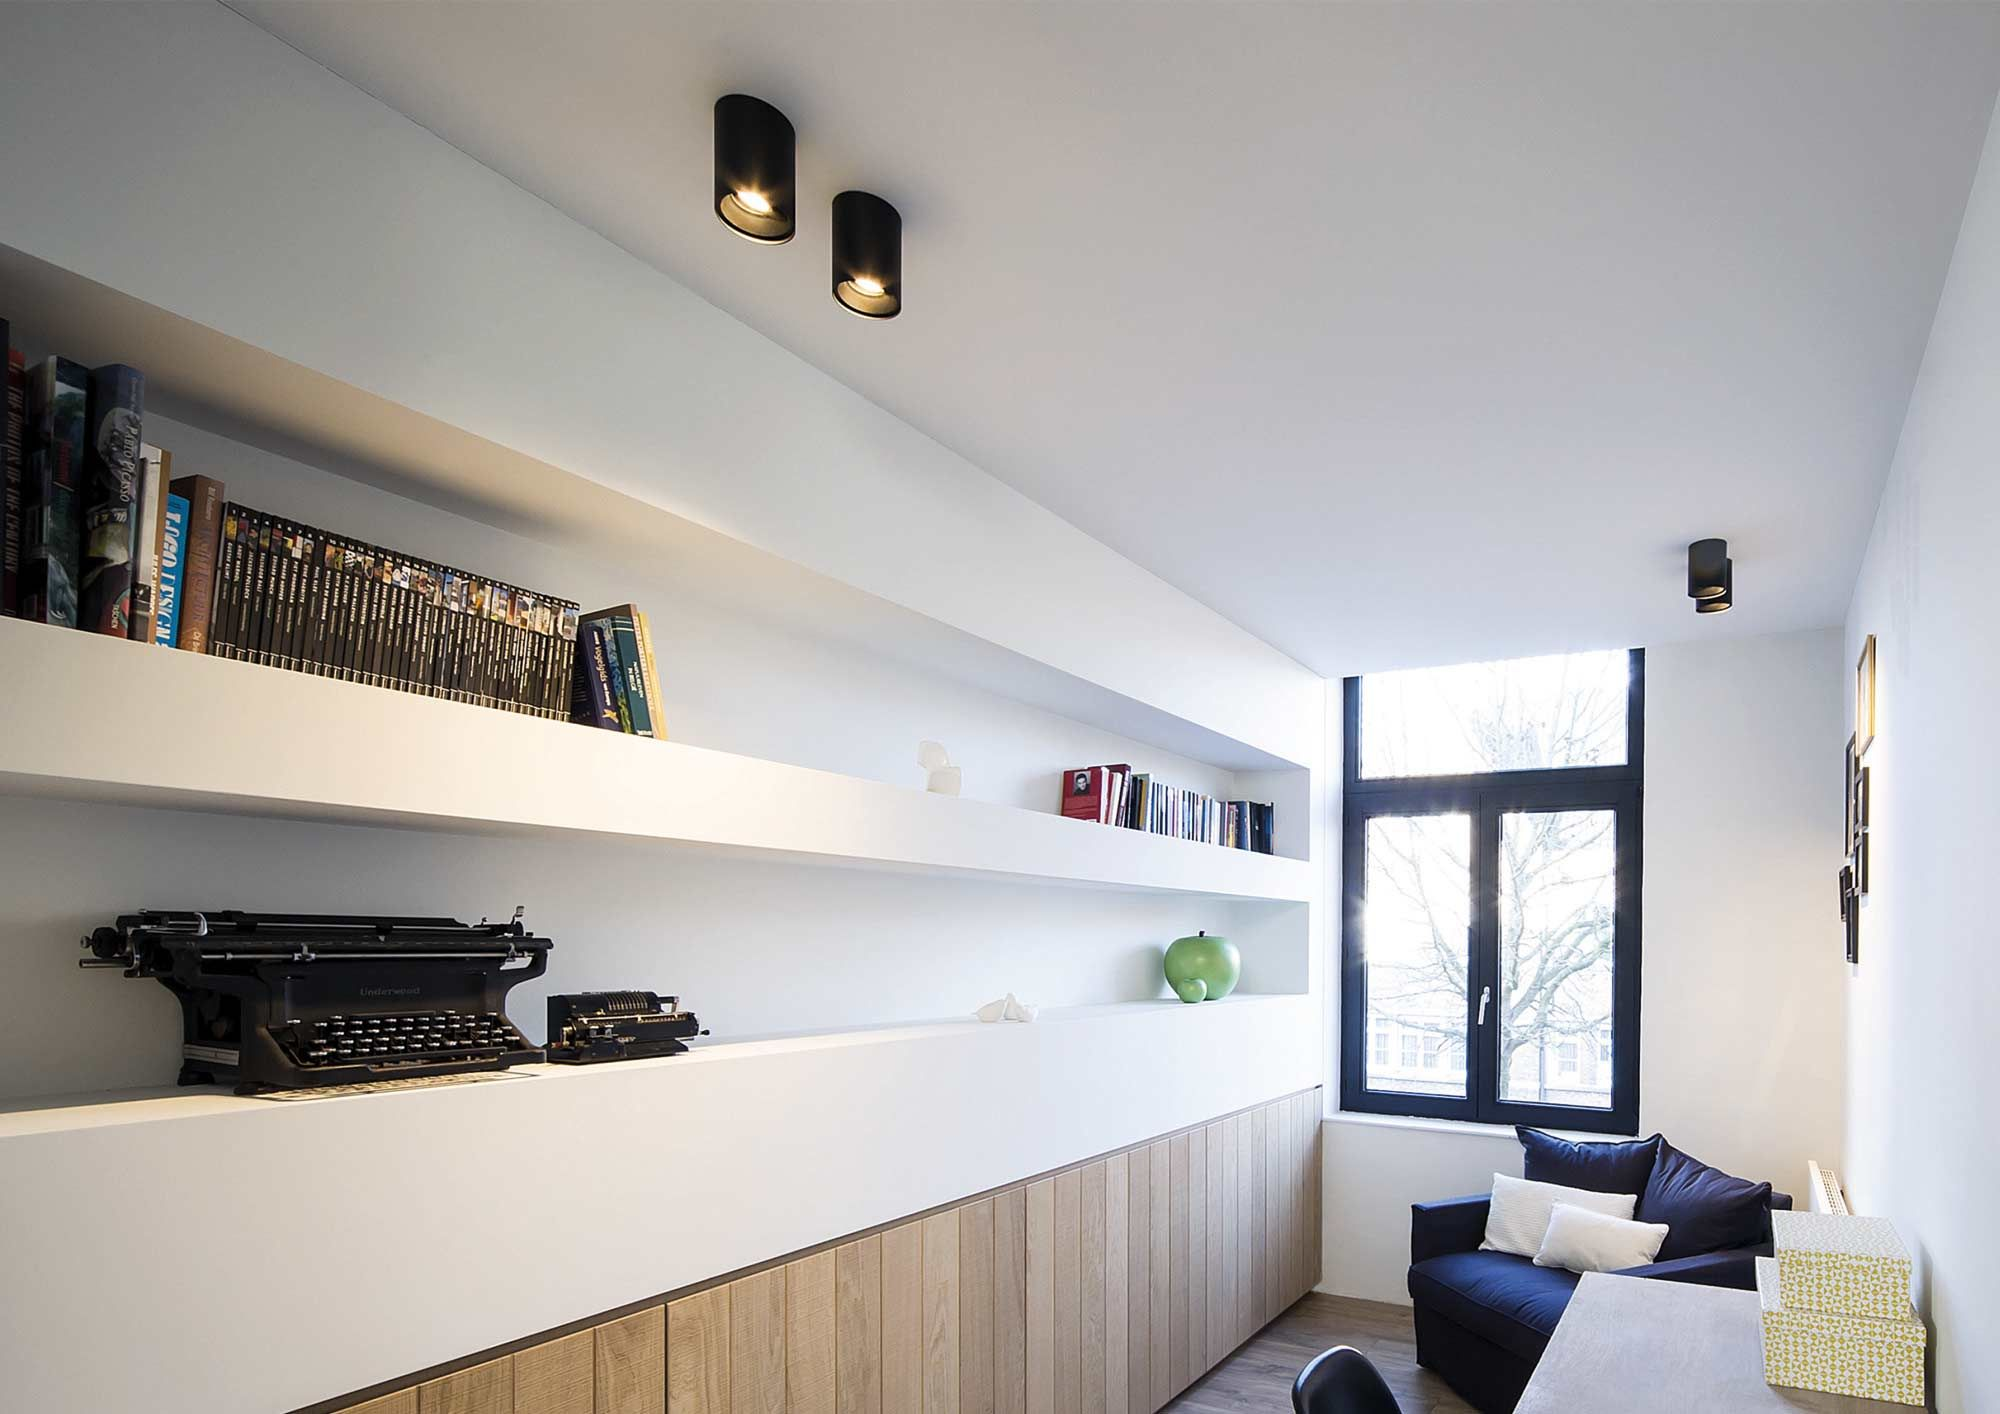 Solid 108 kris dekeijser Lighting Ideas Ceiling light